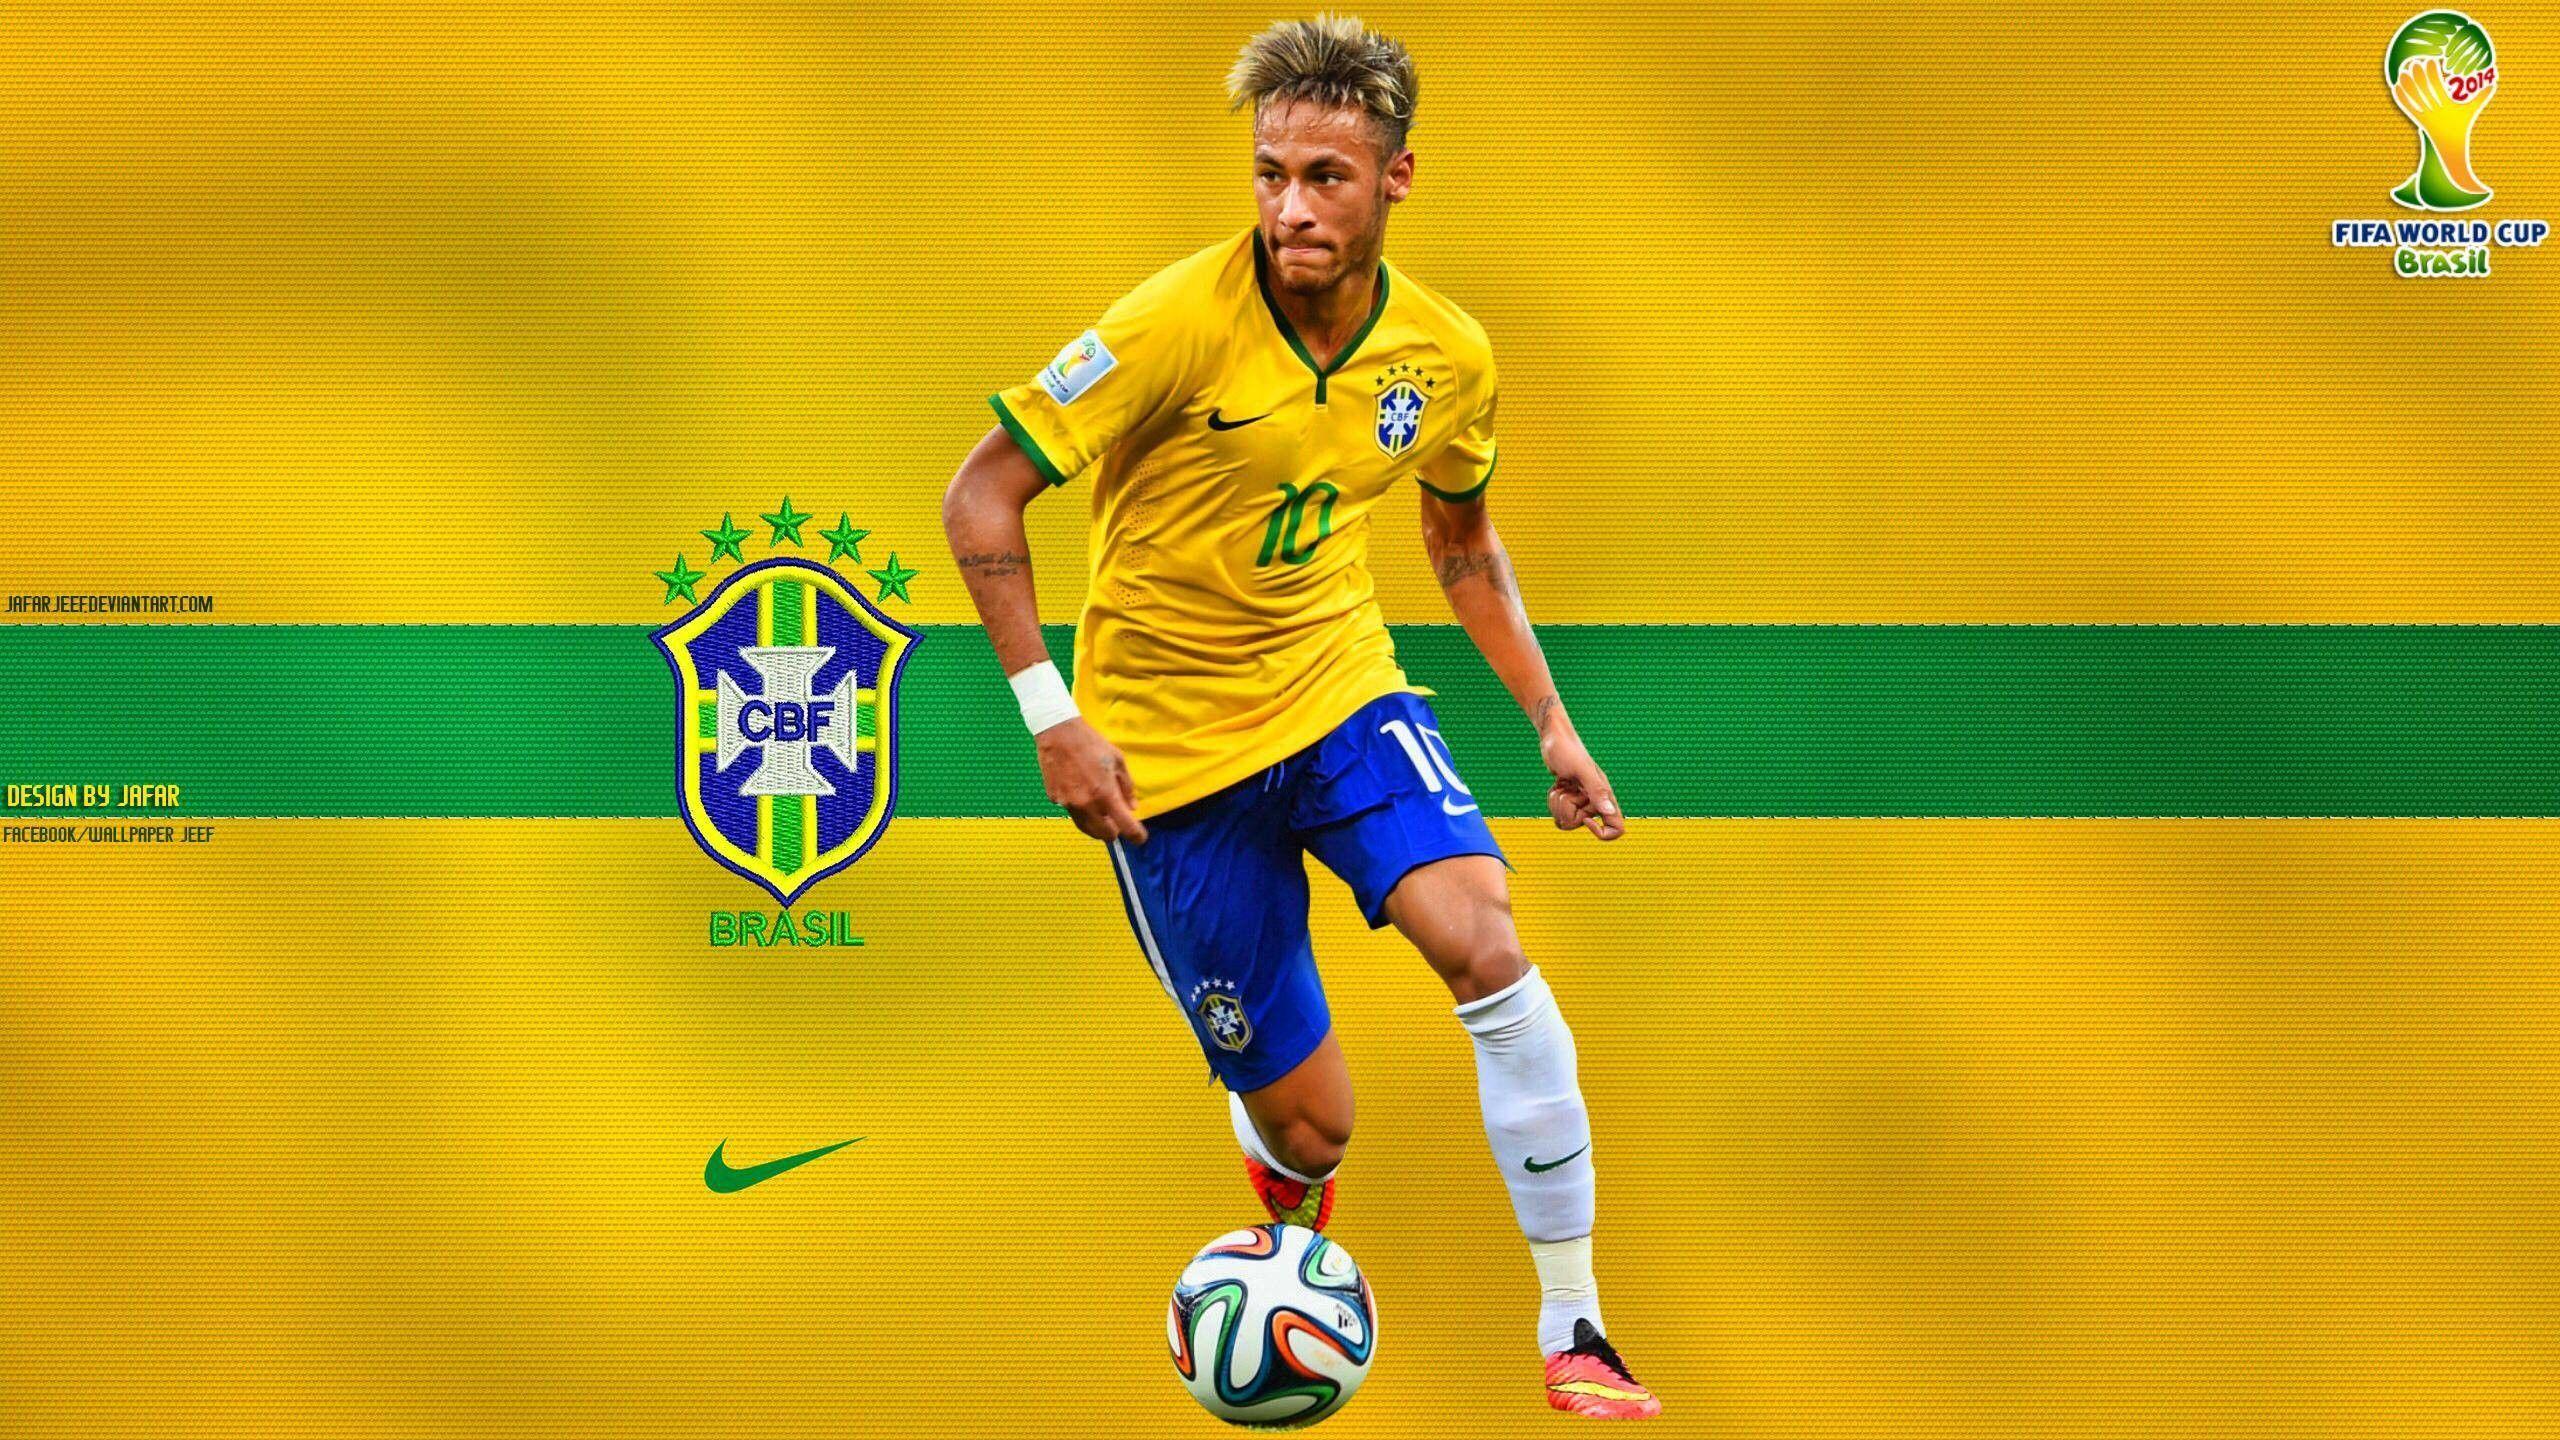 Neymar Wallpaper 2560x1440 Neymar Brazil Neymar Barcelona Neymar